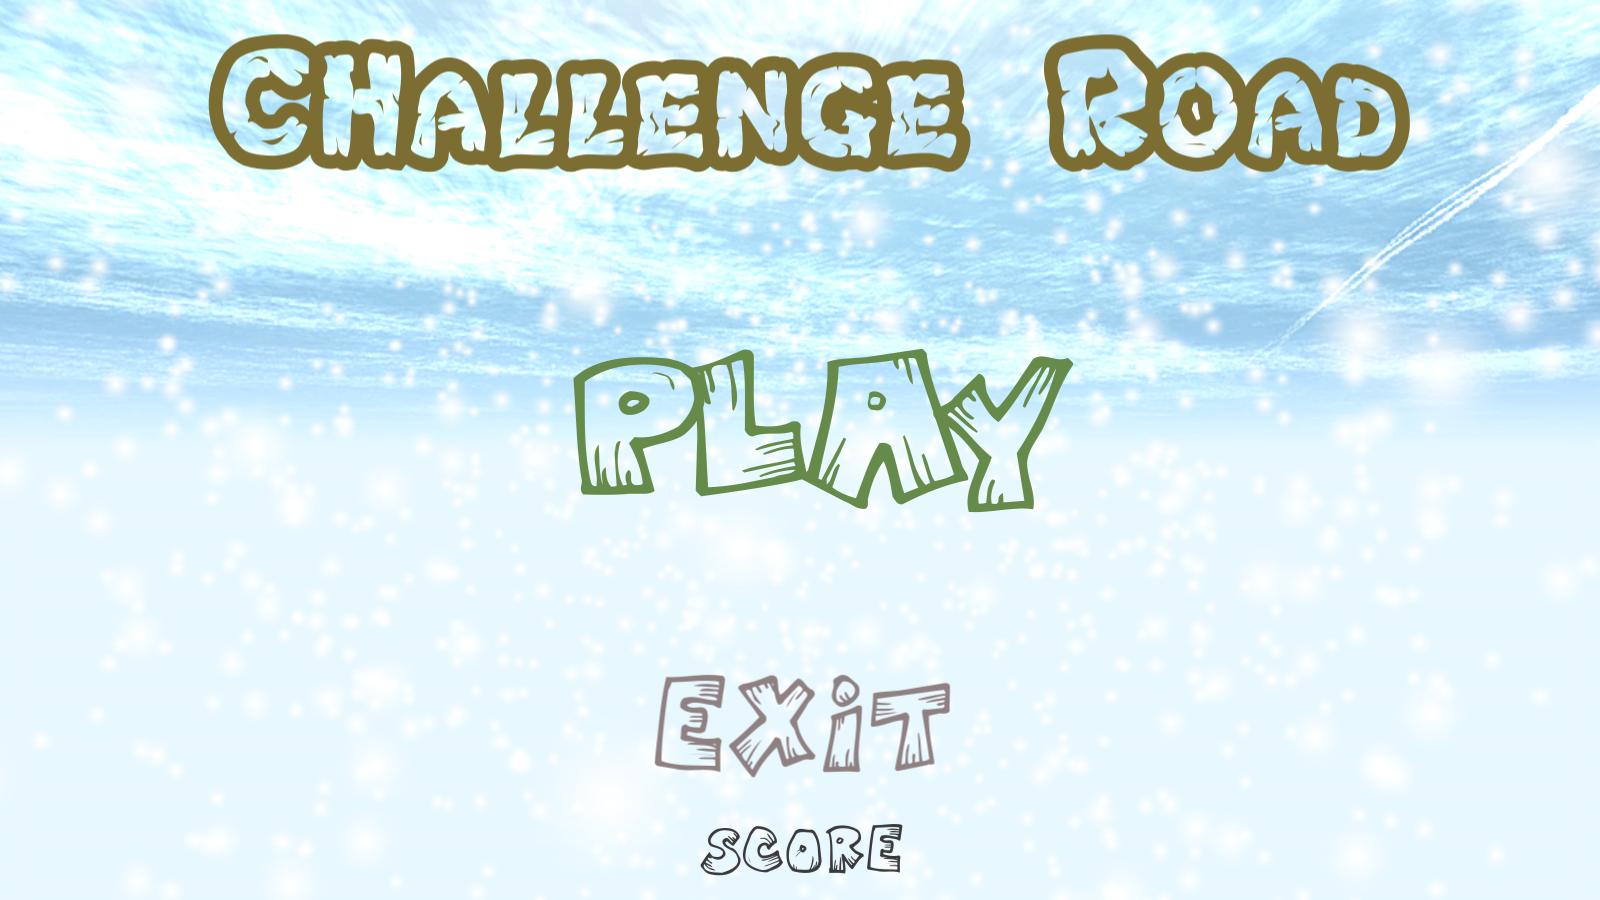 Challenge Road